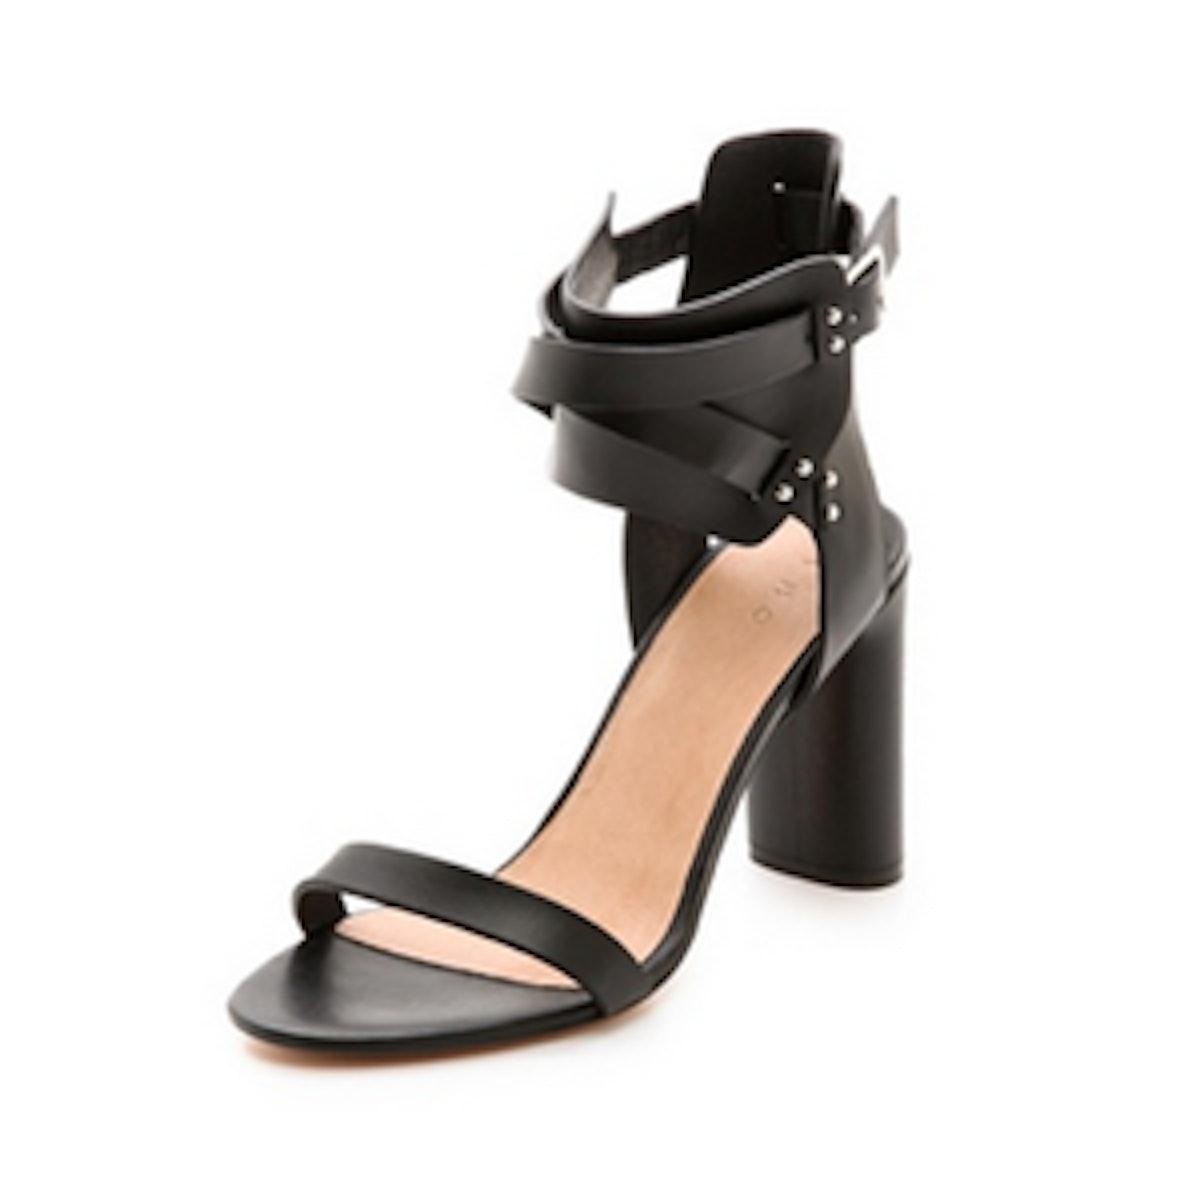 Saldana Sandals